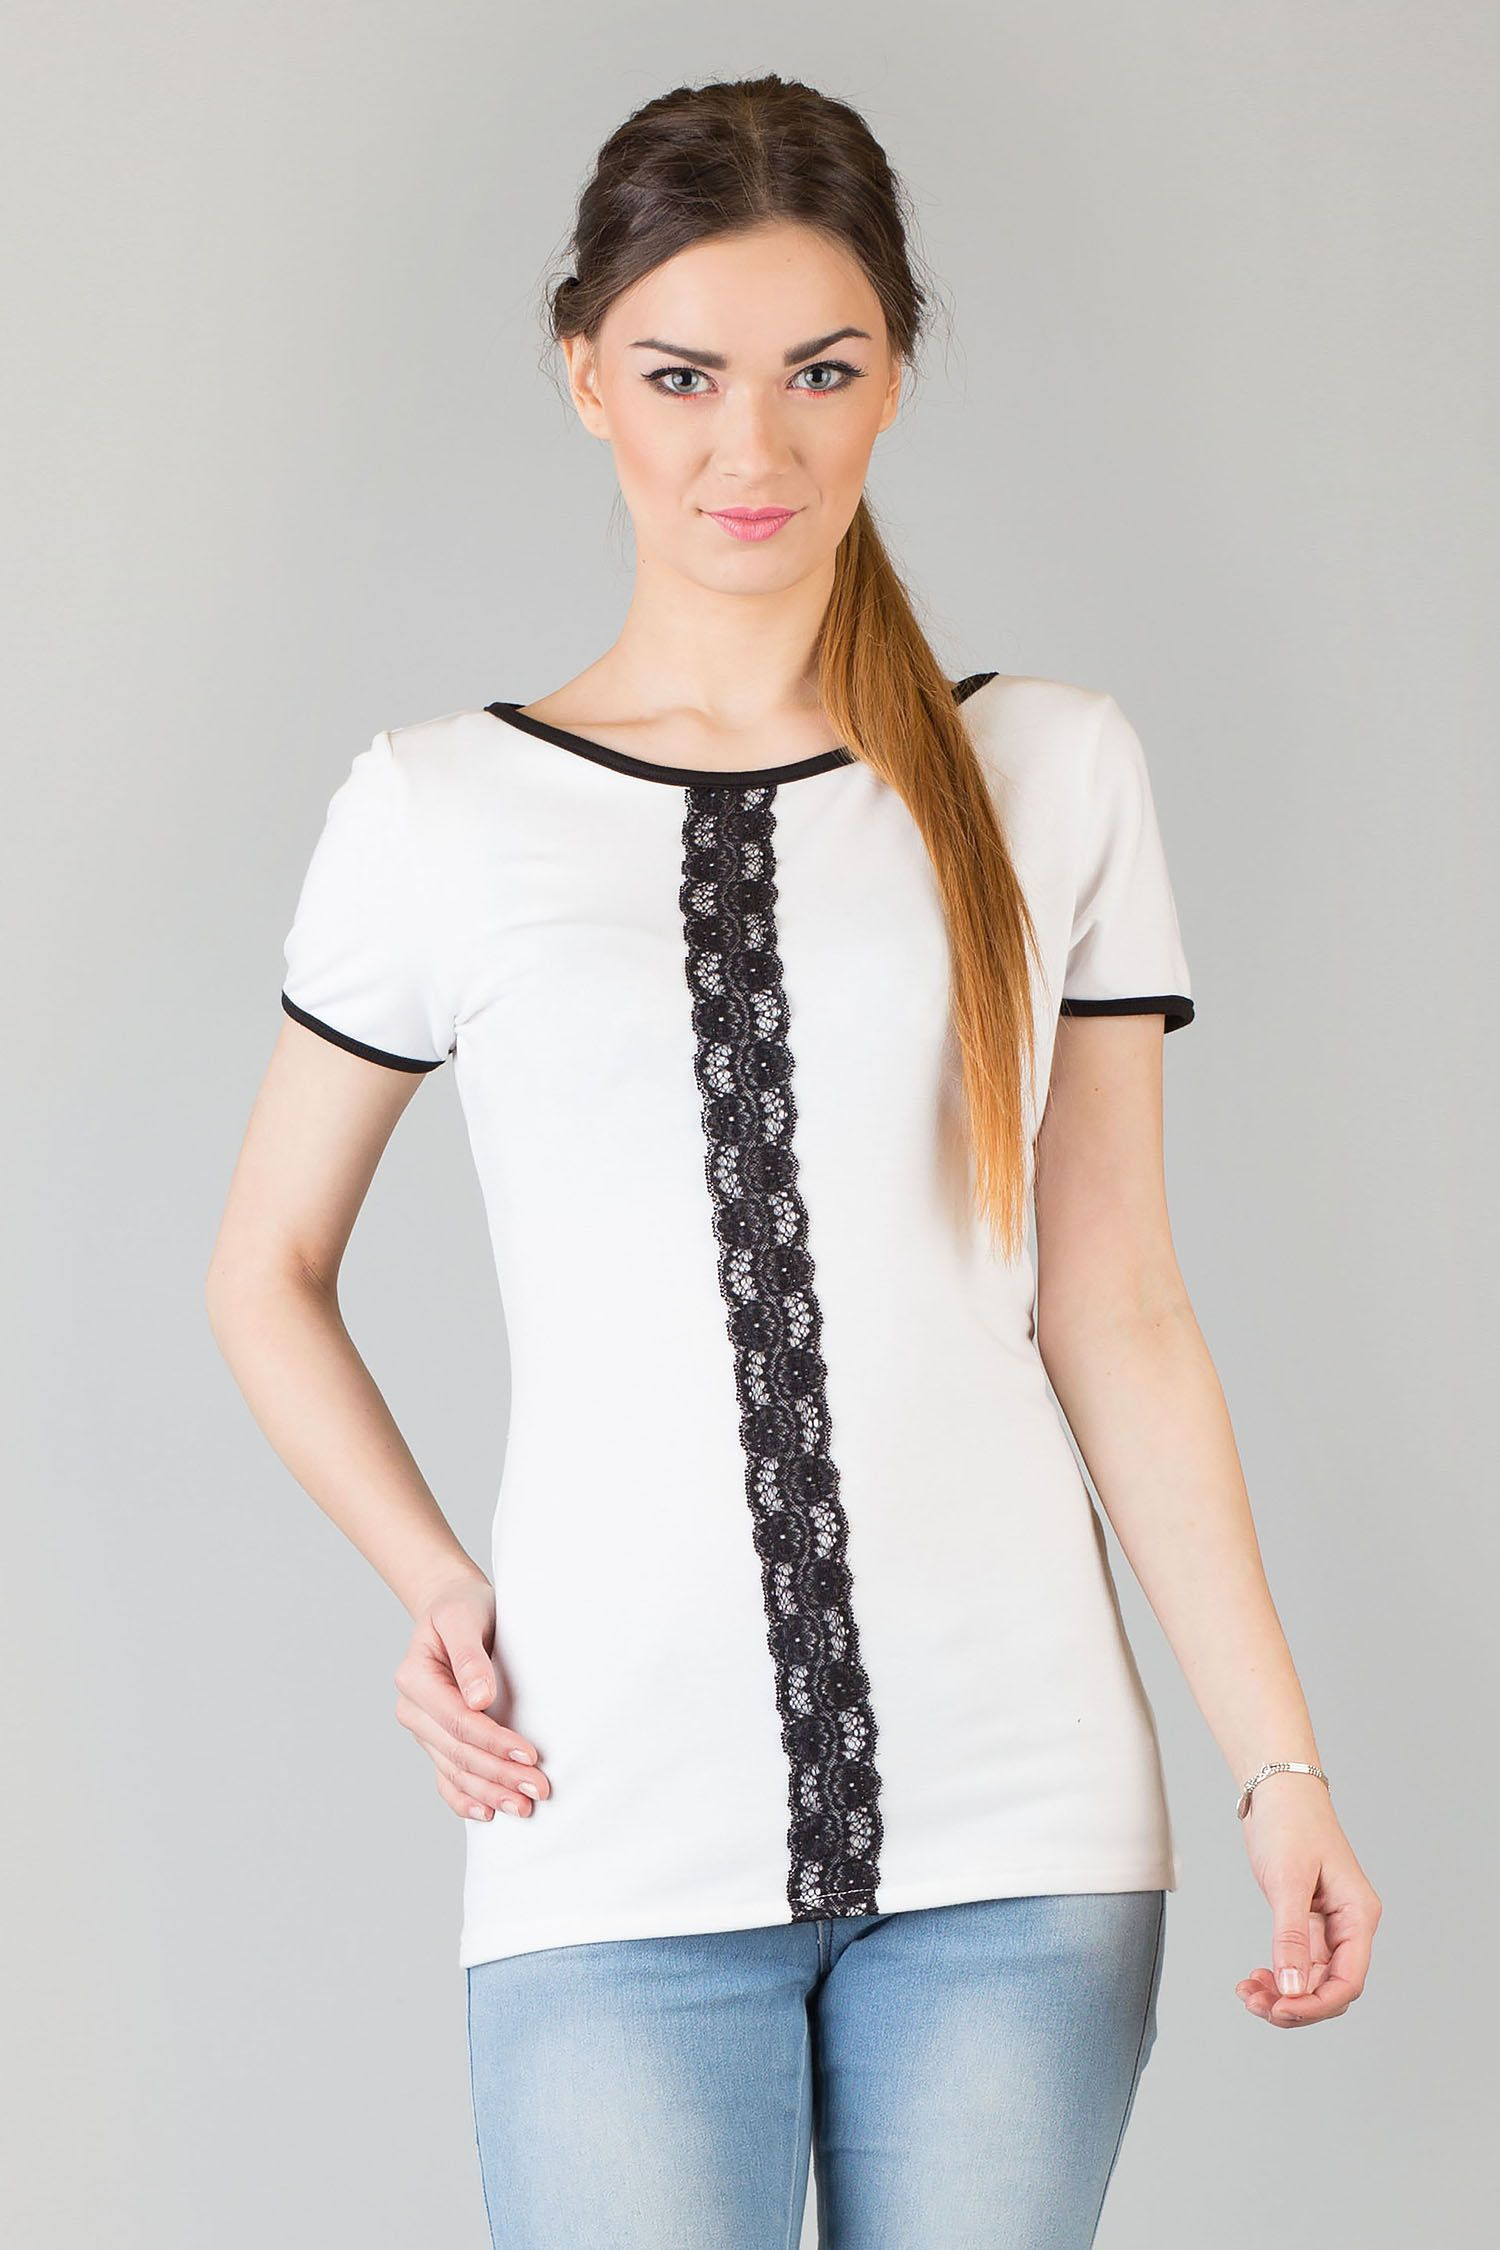 Nice Blouse model 41304 Tessita Check more at http://www.brandsforless.gr/shop/women/blouse-model-41304-tessita/